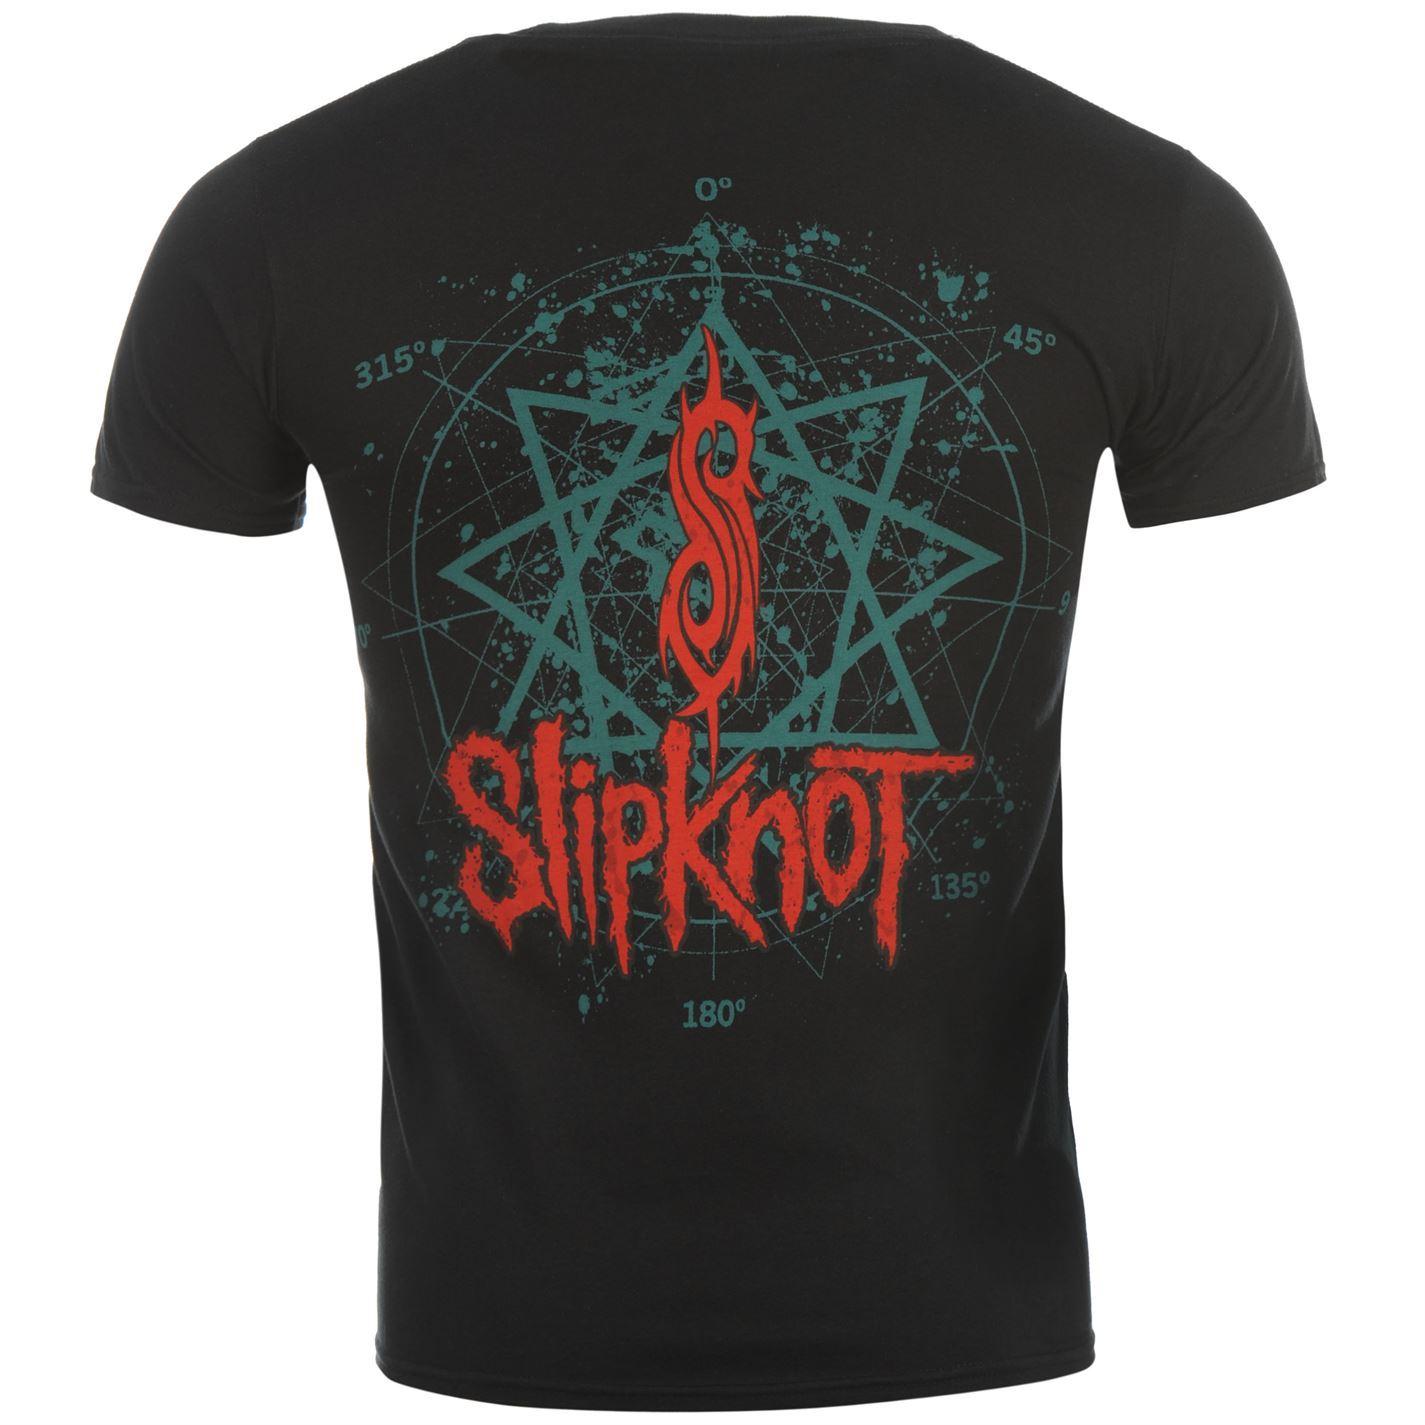 Official-Slipknot-T-Shirt-Mens-Masks-Top-Tee-Tshirt thumbnail 7